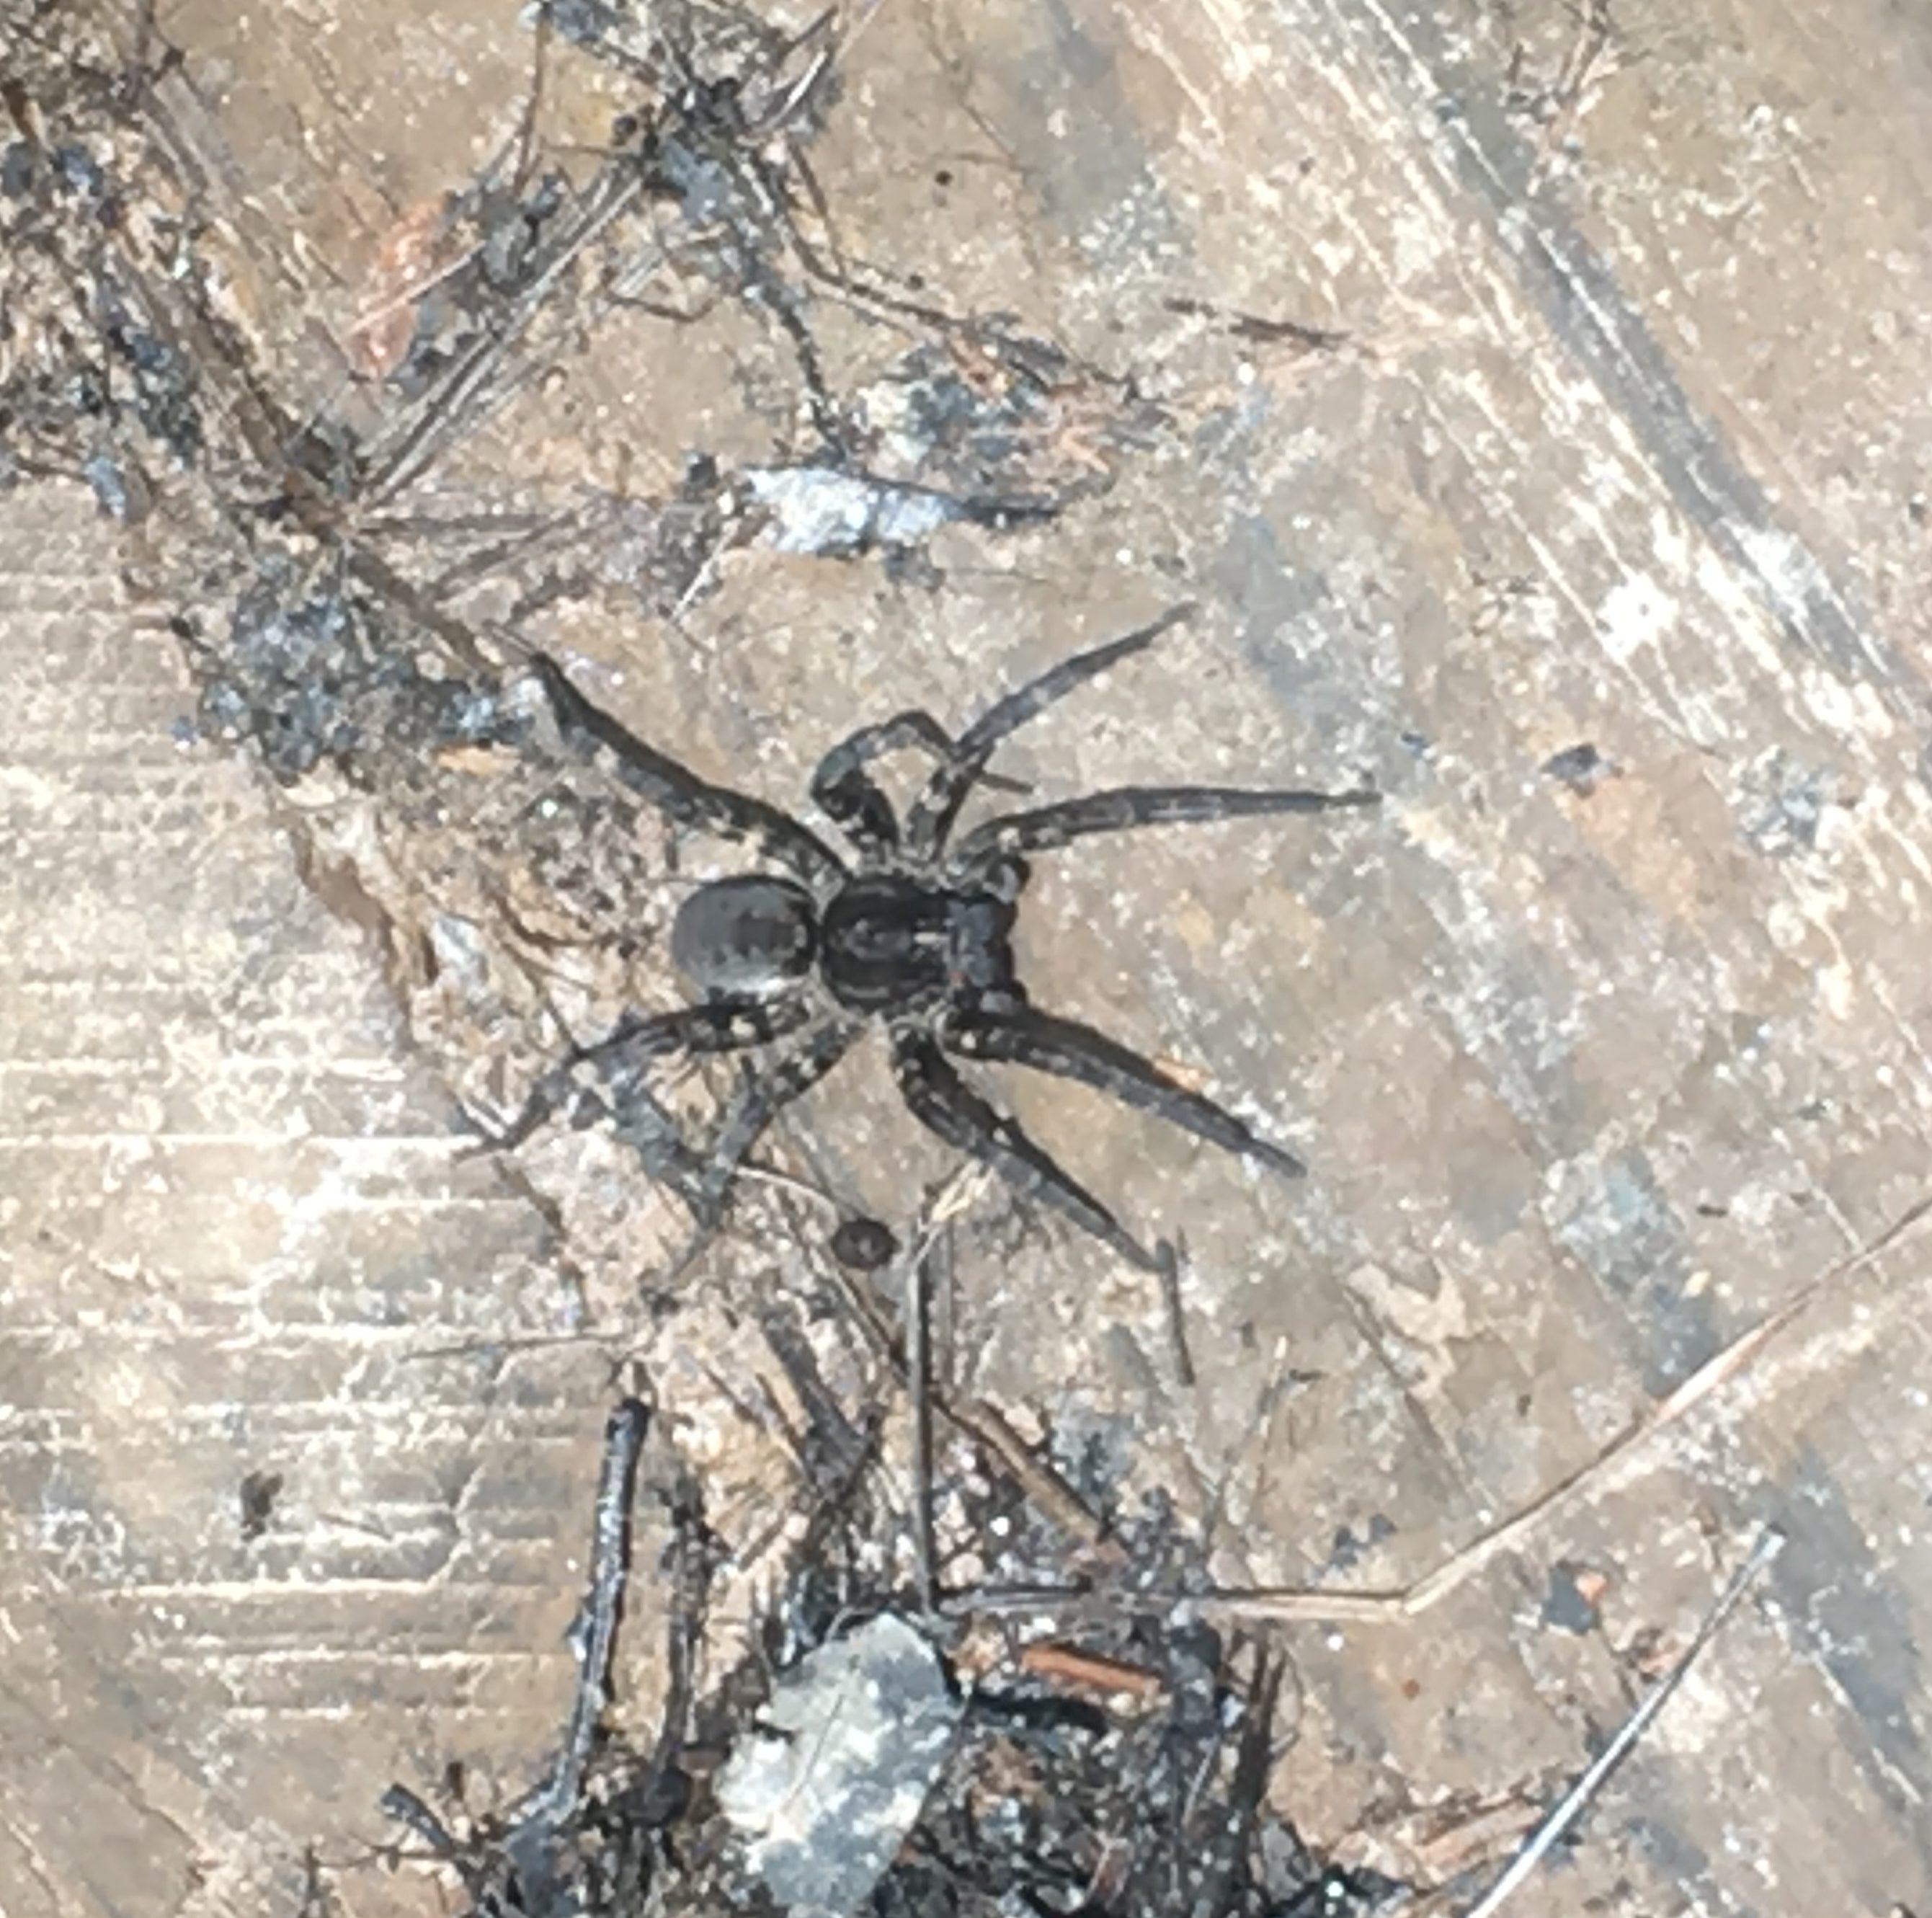 Picture of Tigrosa aspersa (Tiger Wolf Spider) - Female - Dorsal